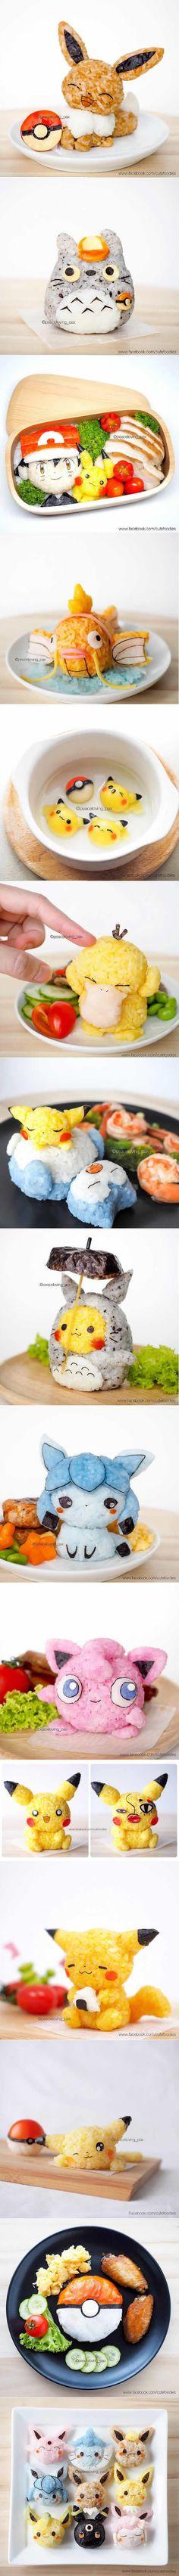 Onigiri rice ball and bento. Gotta eat 'em all. (By Peaceloving Pax) #pikachu #pokemon #kidsbento